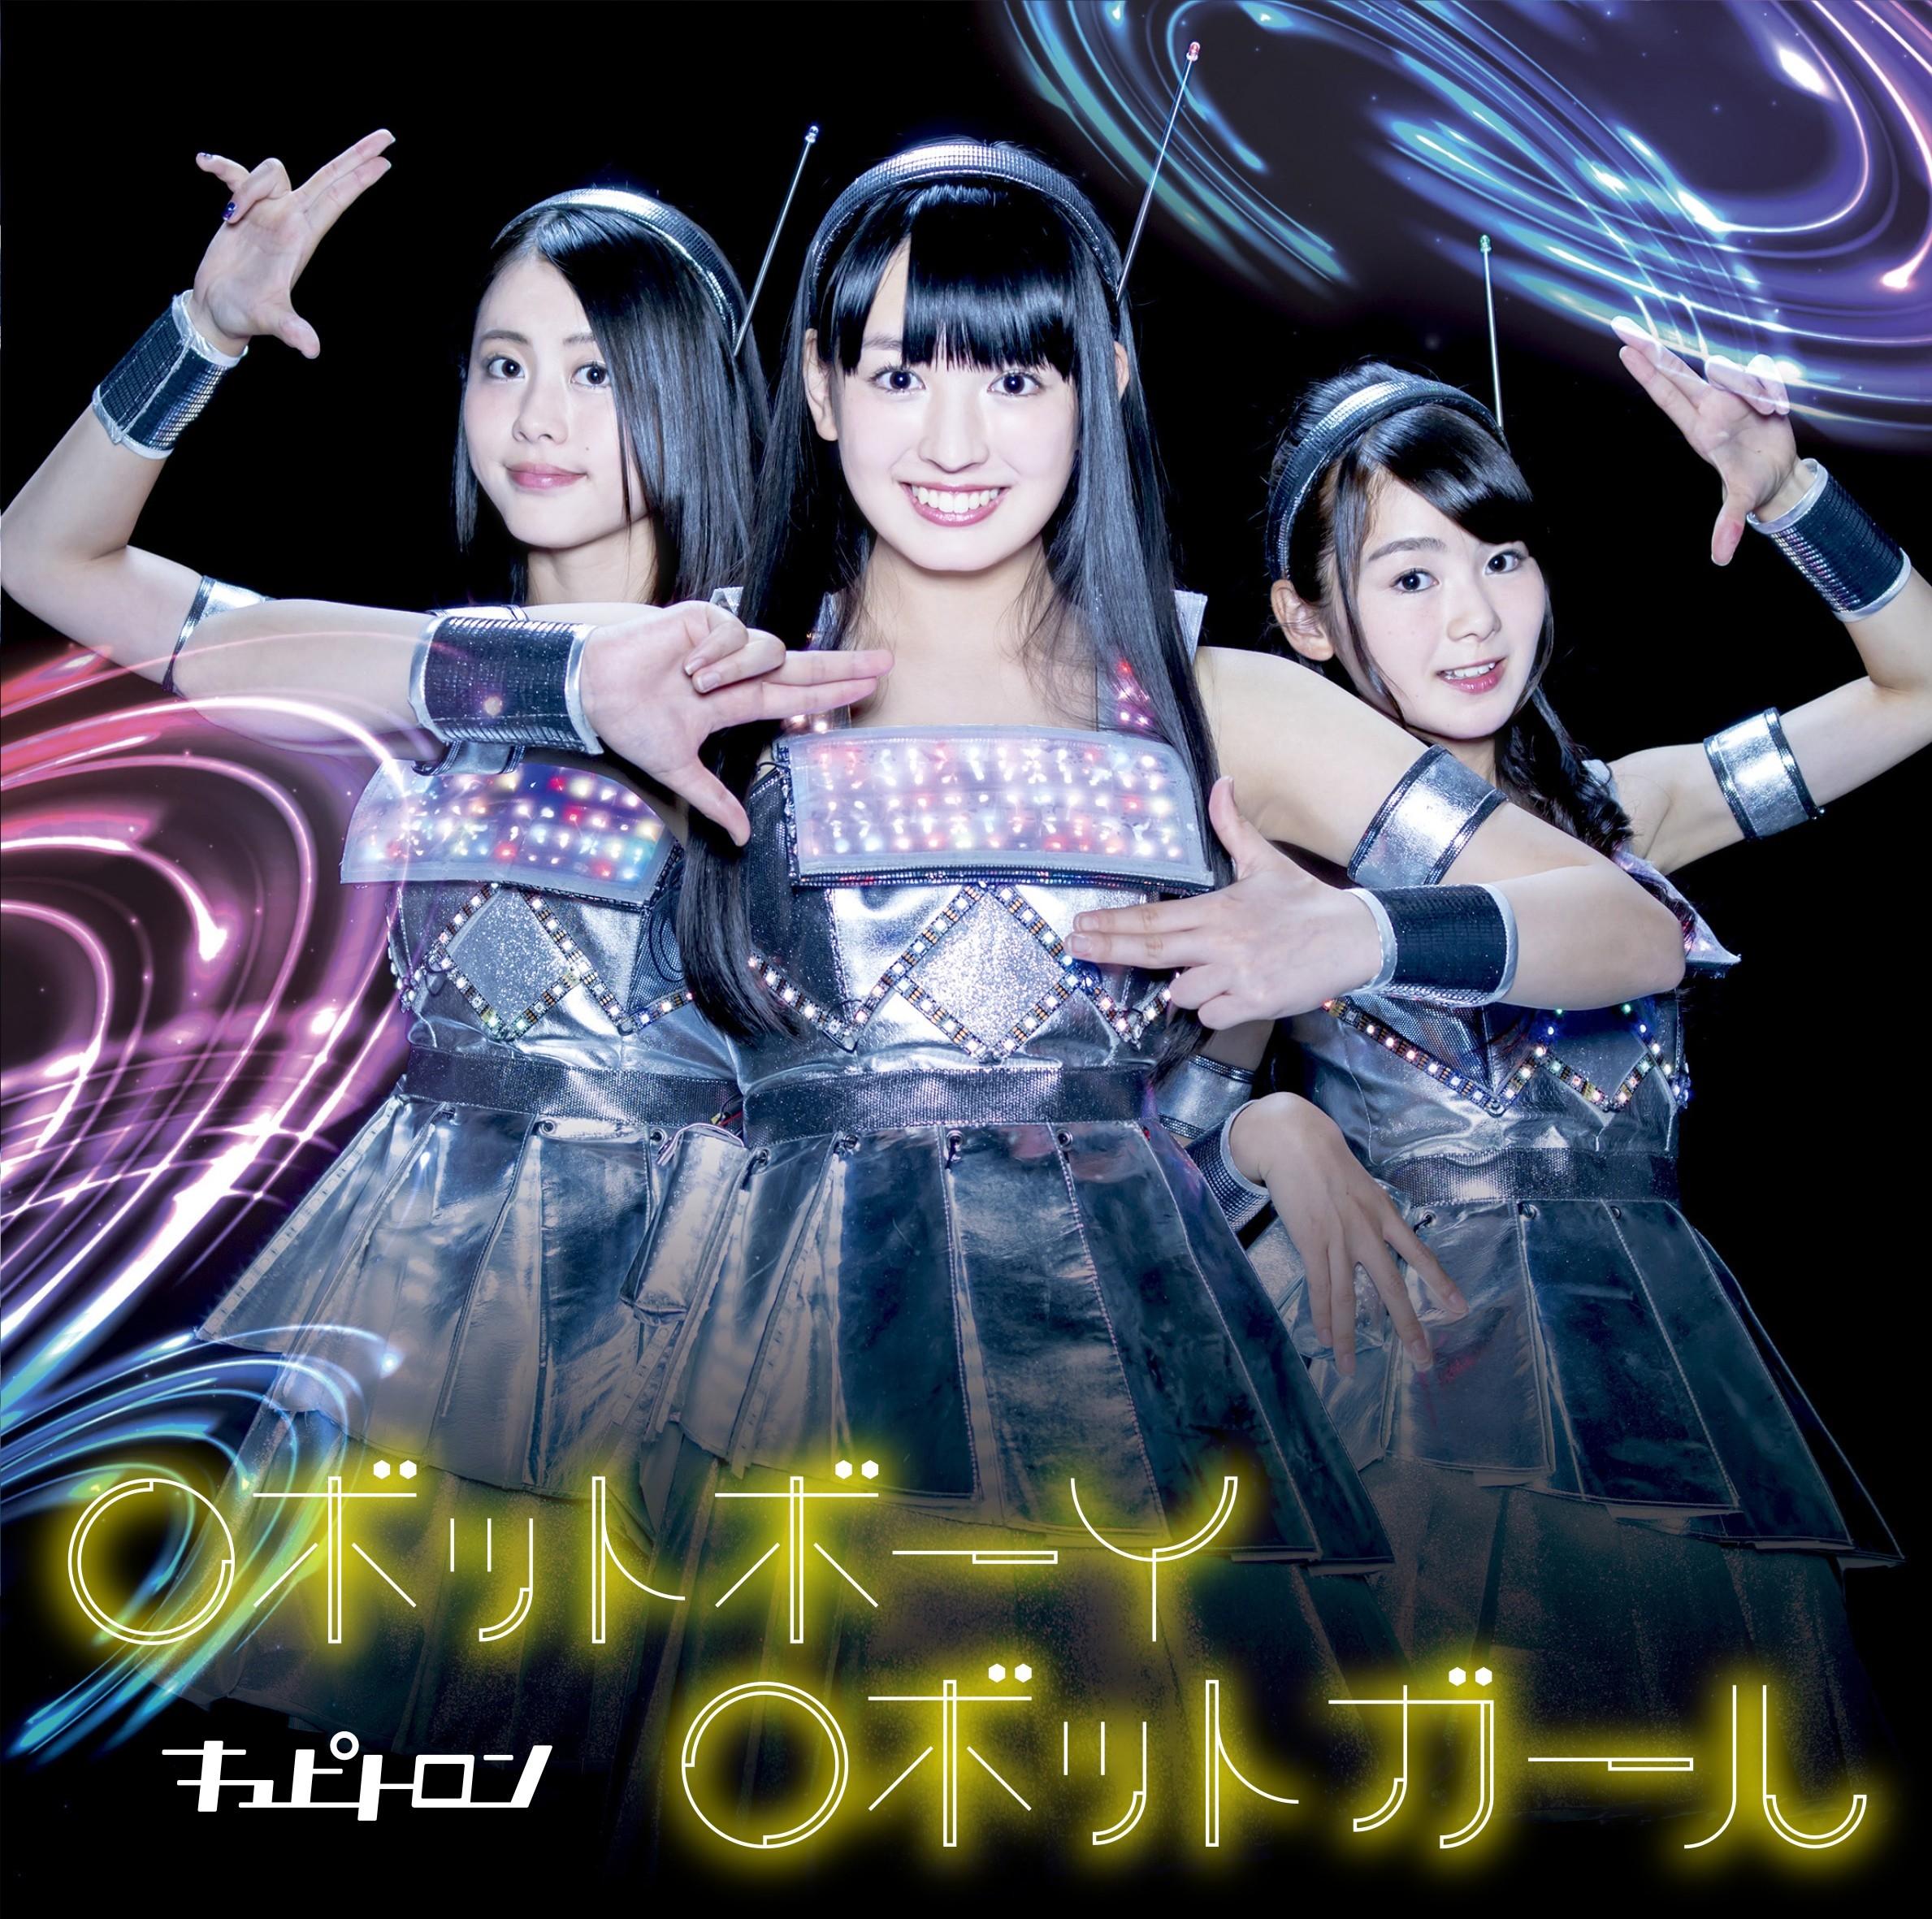 20161117.03.52 Cupitron - Robot Boy, Robot Girl (Type B) cover.jpg